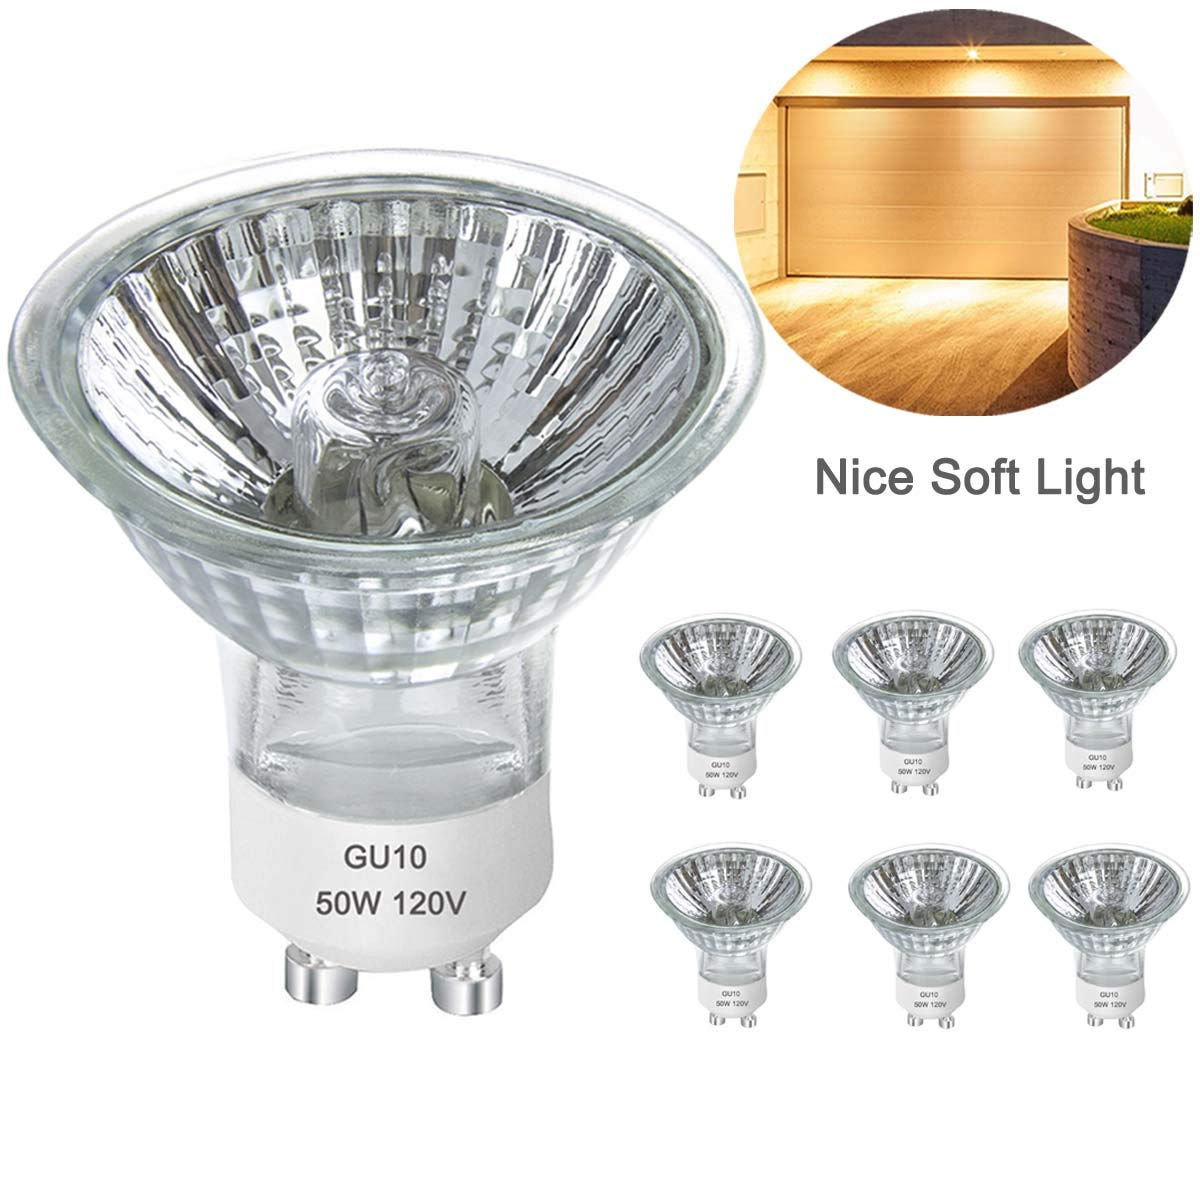 GU10 Bulb, 6pcs 120V 50W GU10 Halogen Flood Light Bulbs, Premium Quality for Long Lasting Life, GU10 Base, MR16/FL/GU10, MR16 with Glass Cover for Accent Light, Tracking Light, Landscape Lights